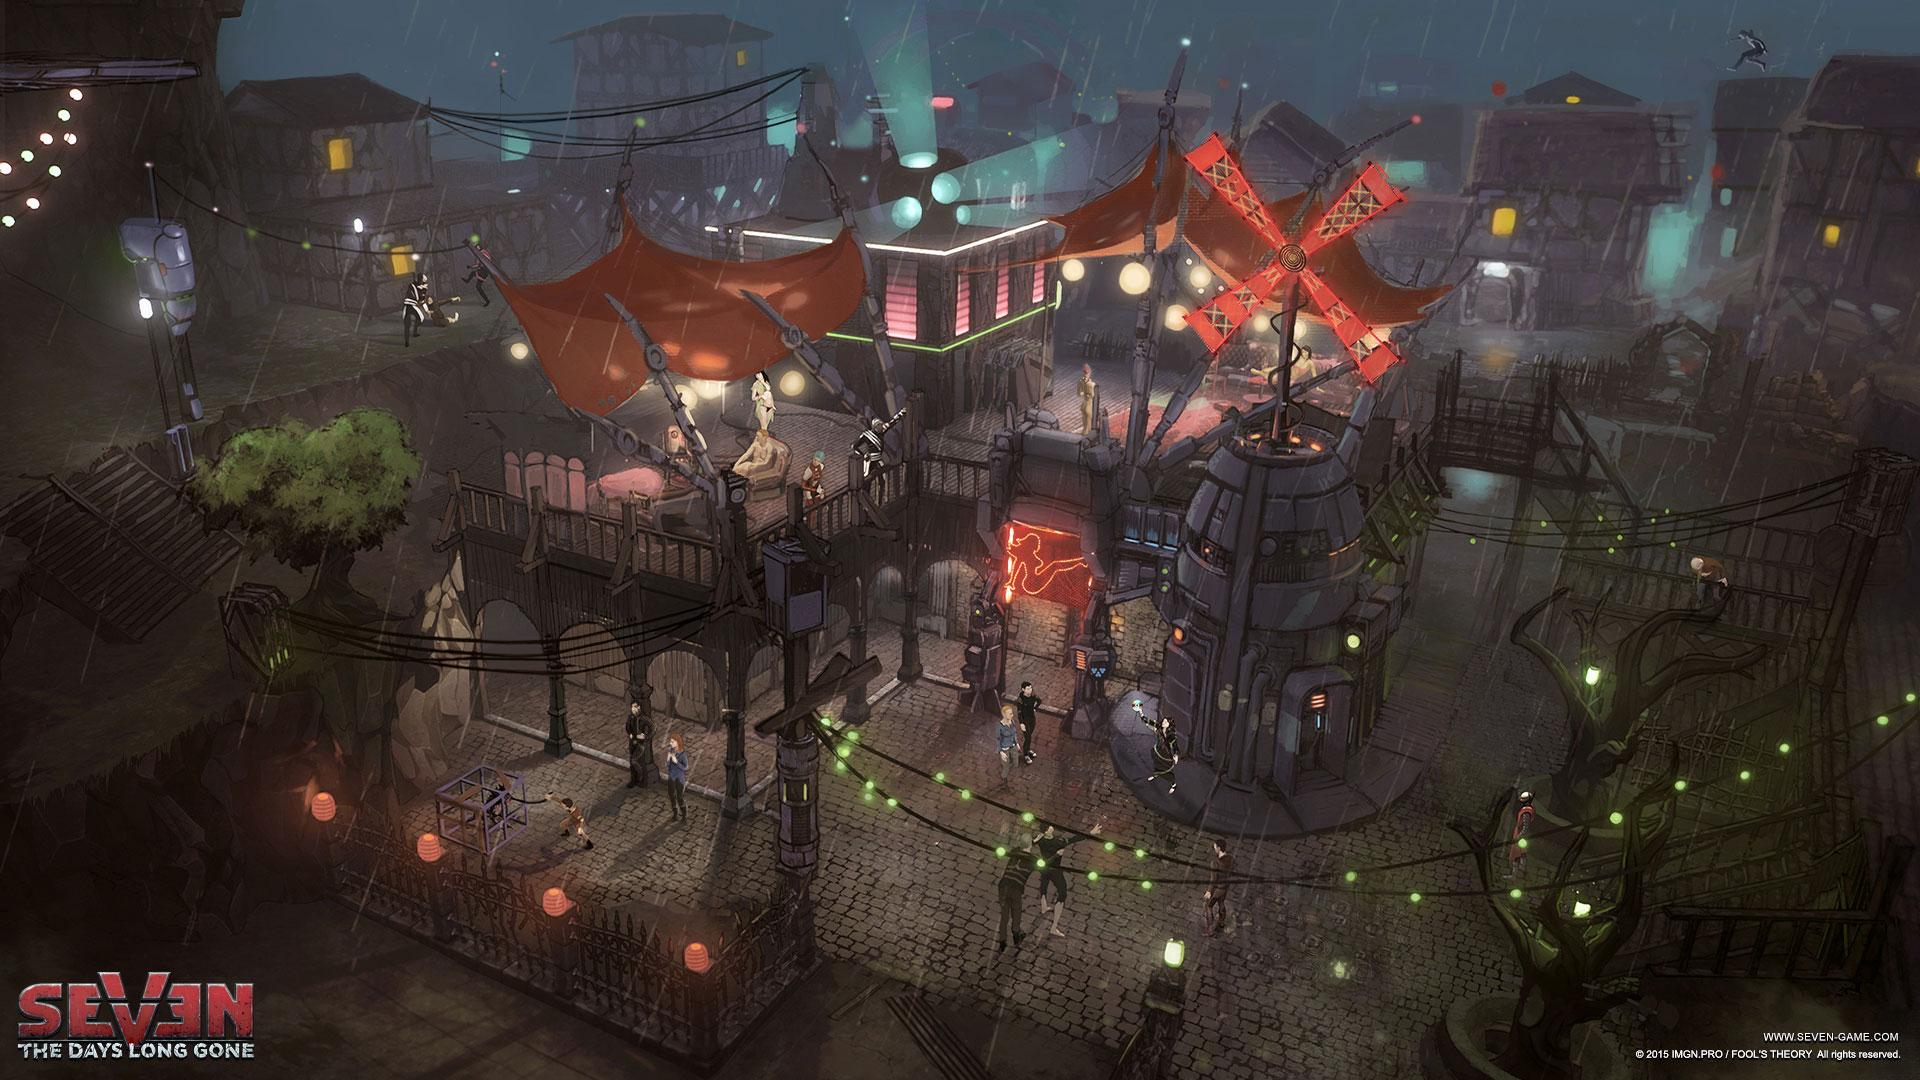 Обзор Seven: The Days Long Gone — техномагический стелс от создателей The Witcher 3: Wild Hunt